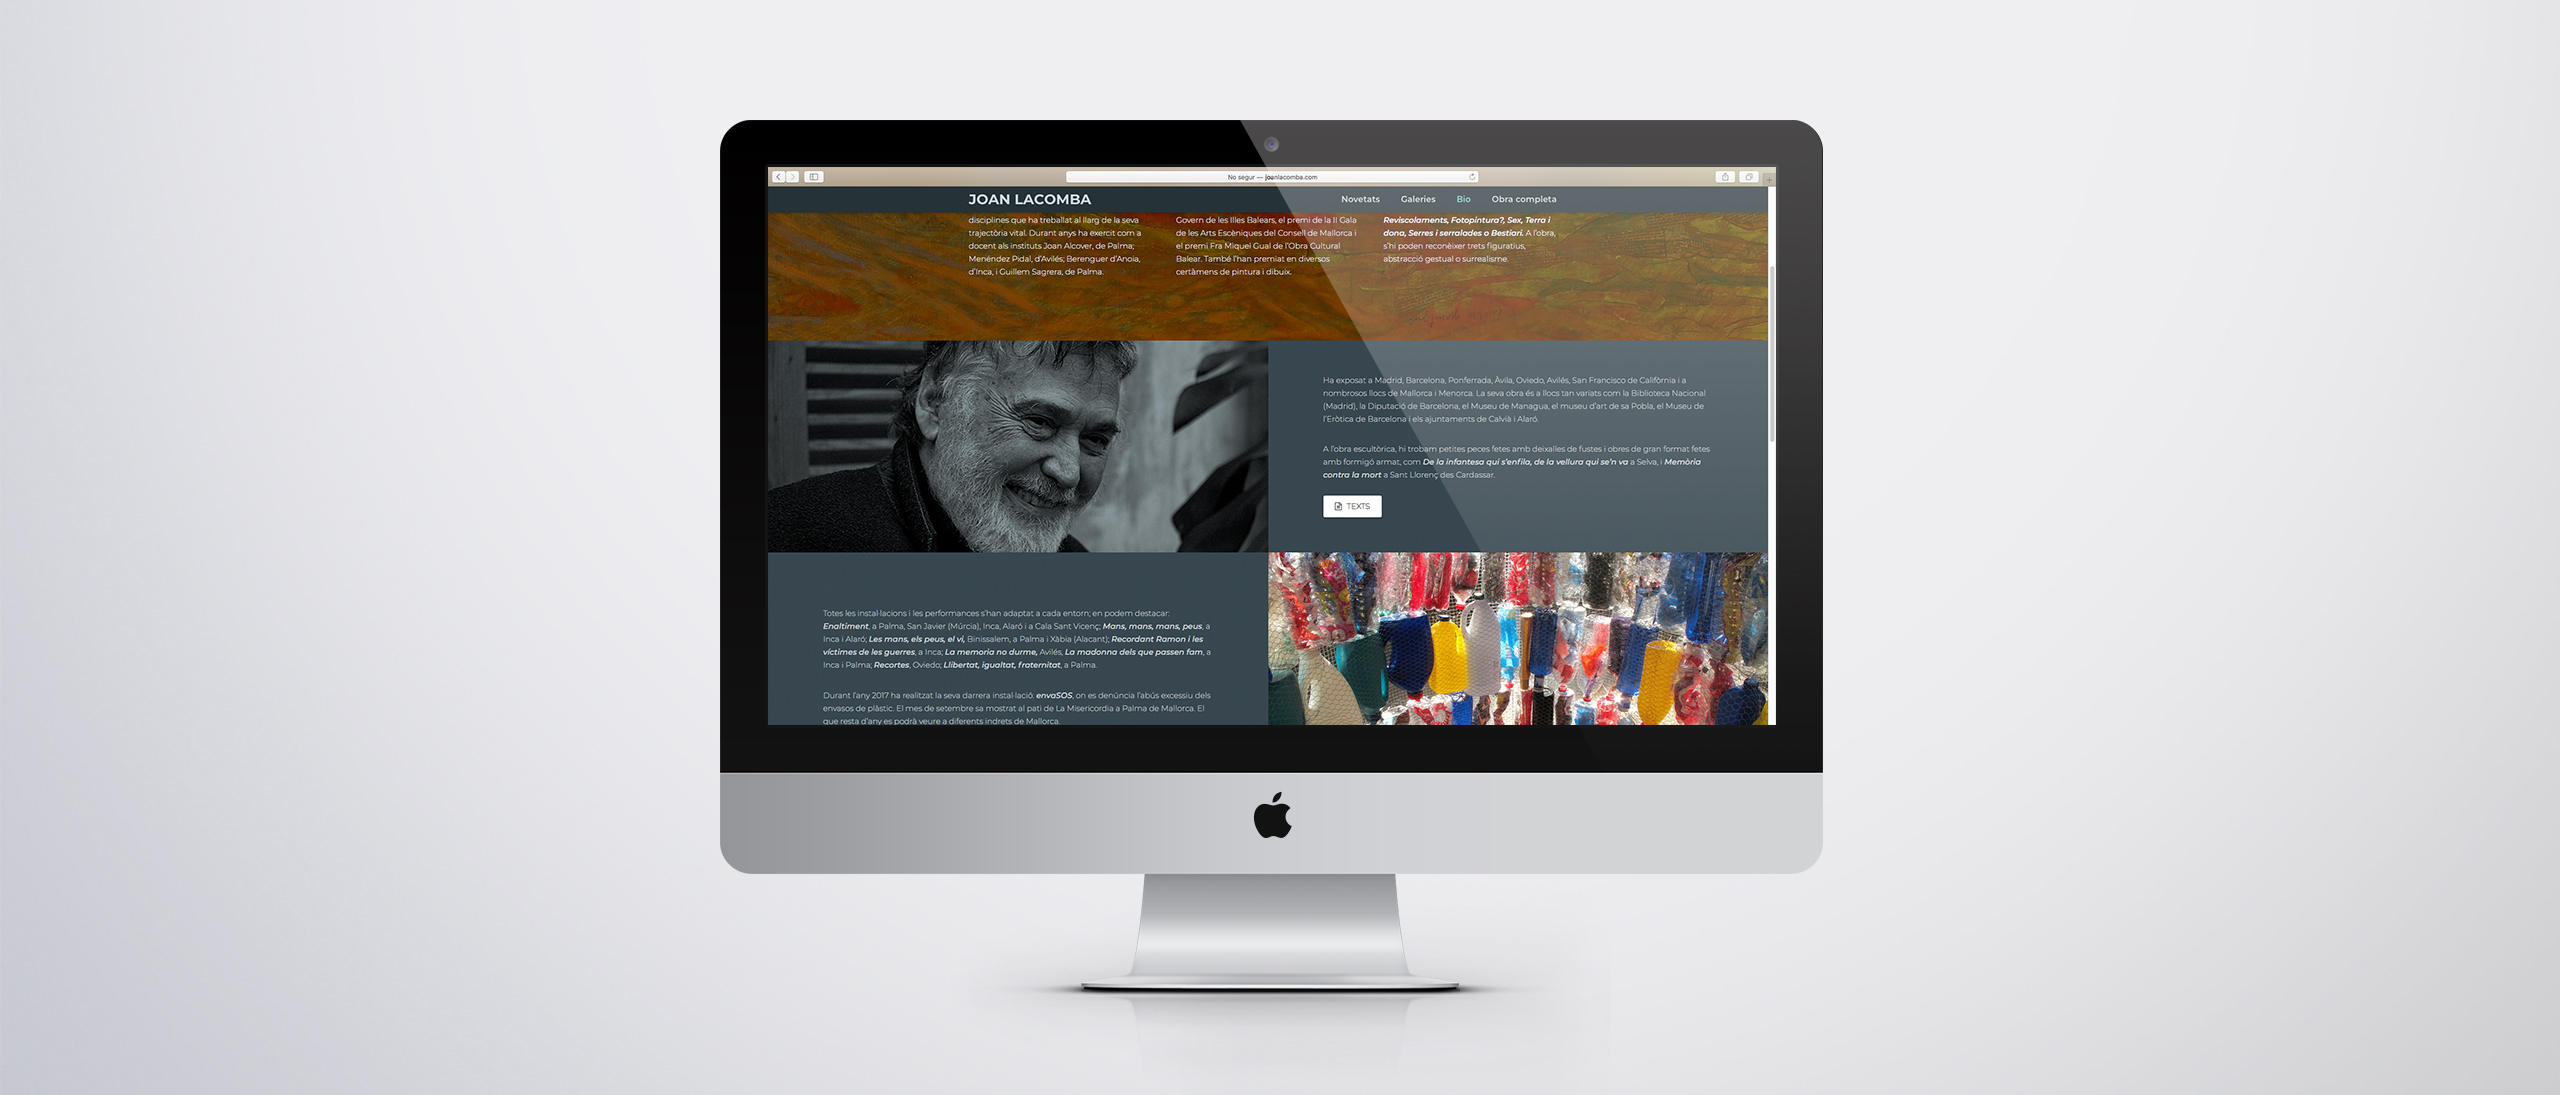 Joan Lacomba webpage